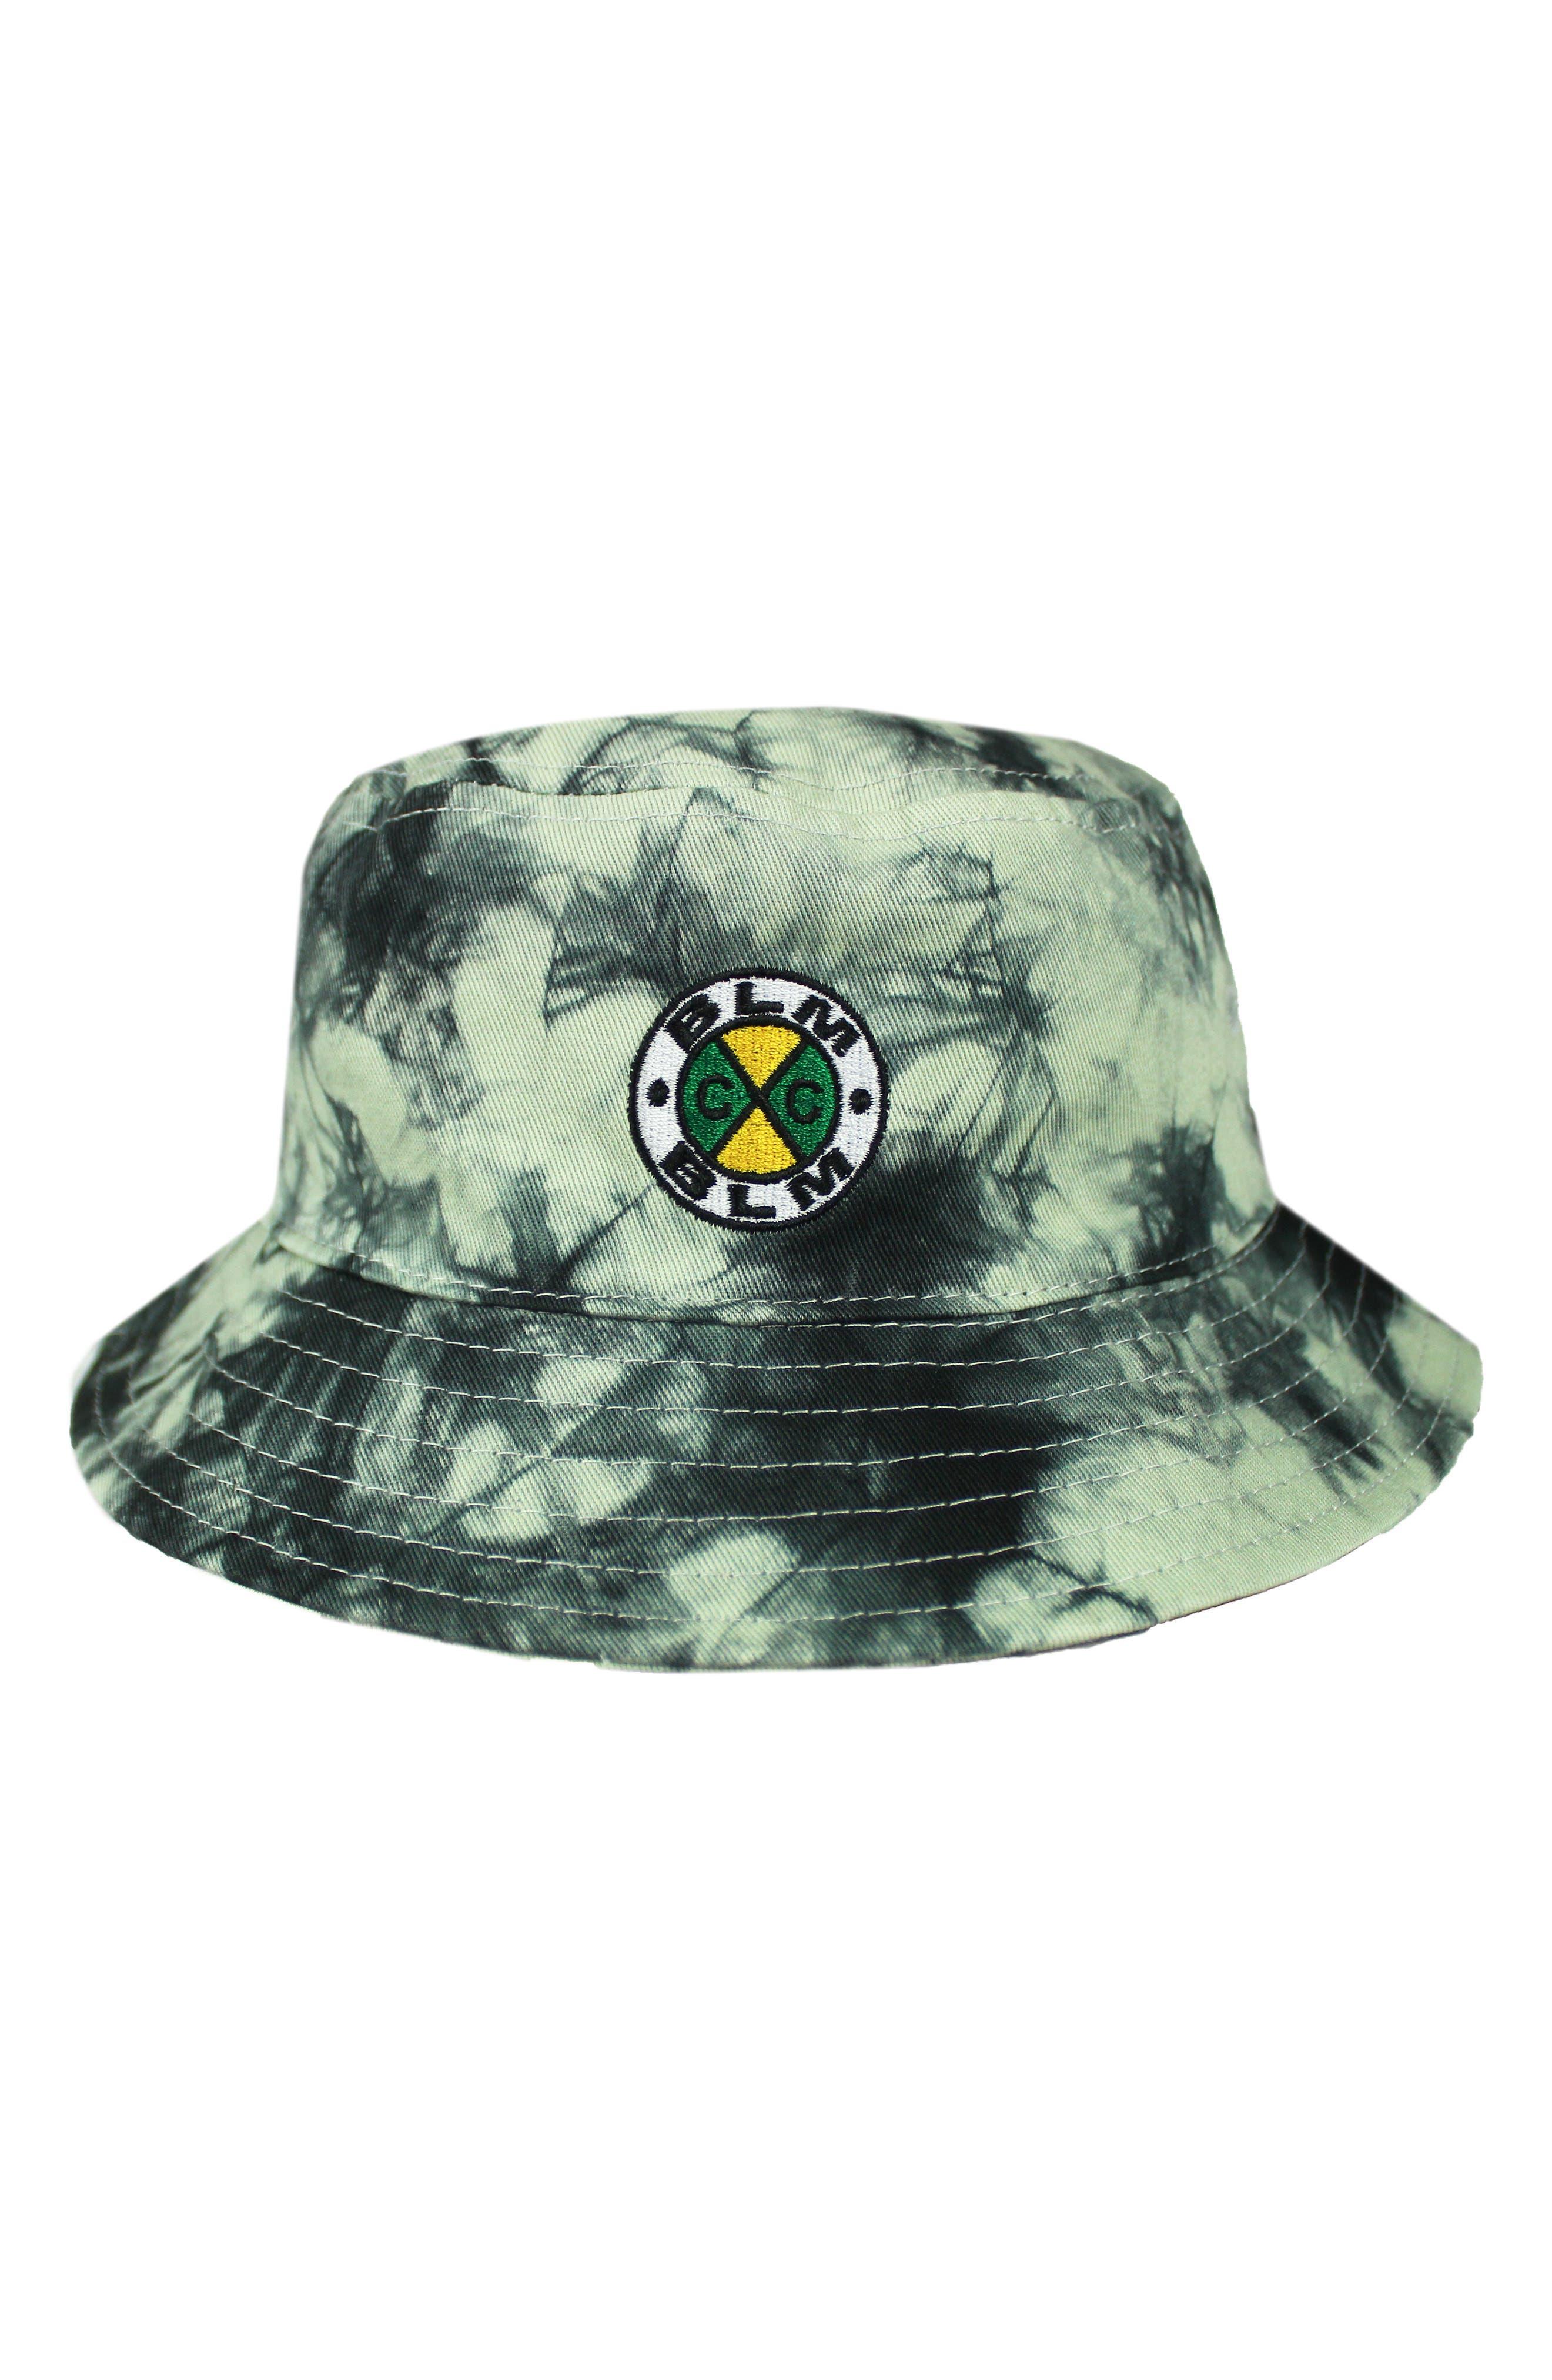 Cxc Blm Bucket Hat